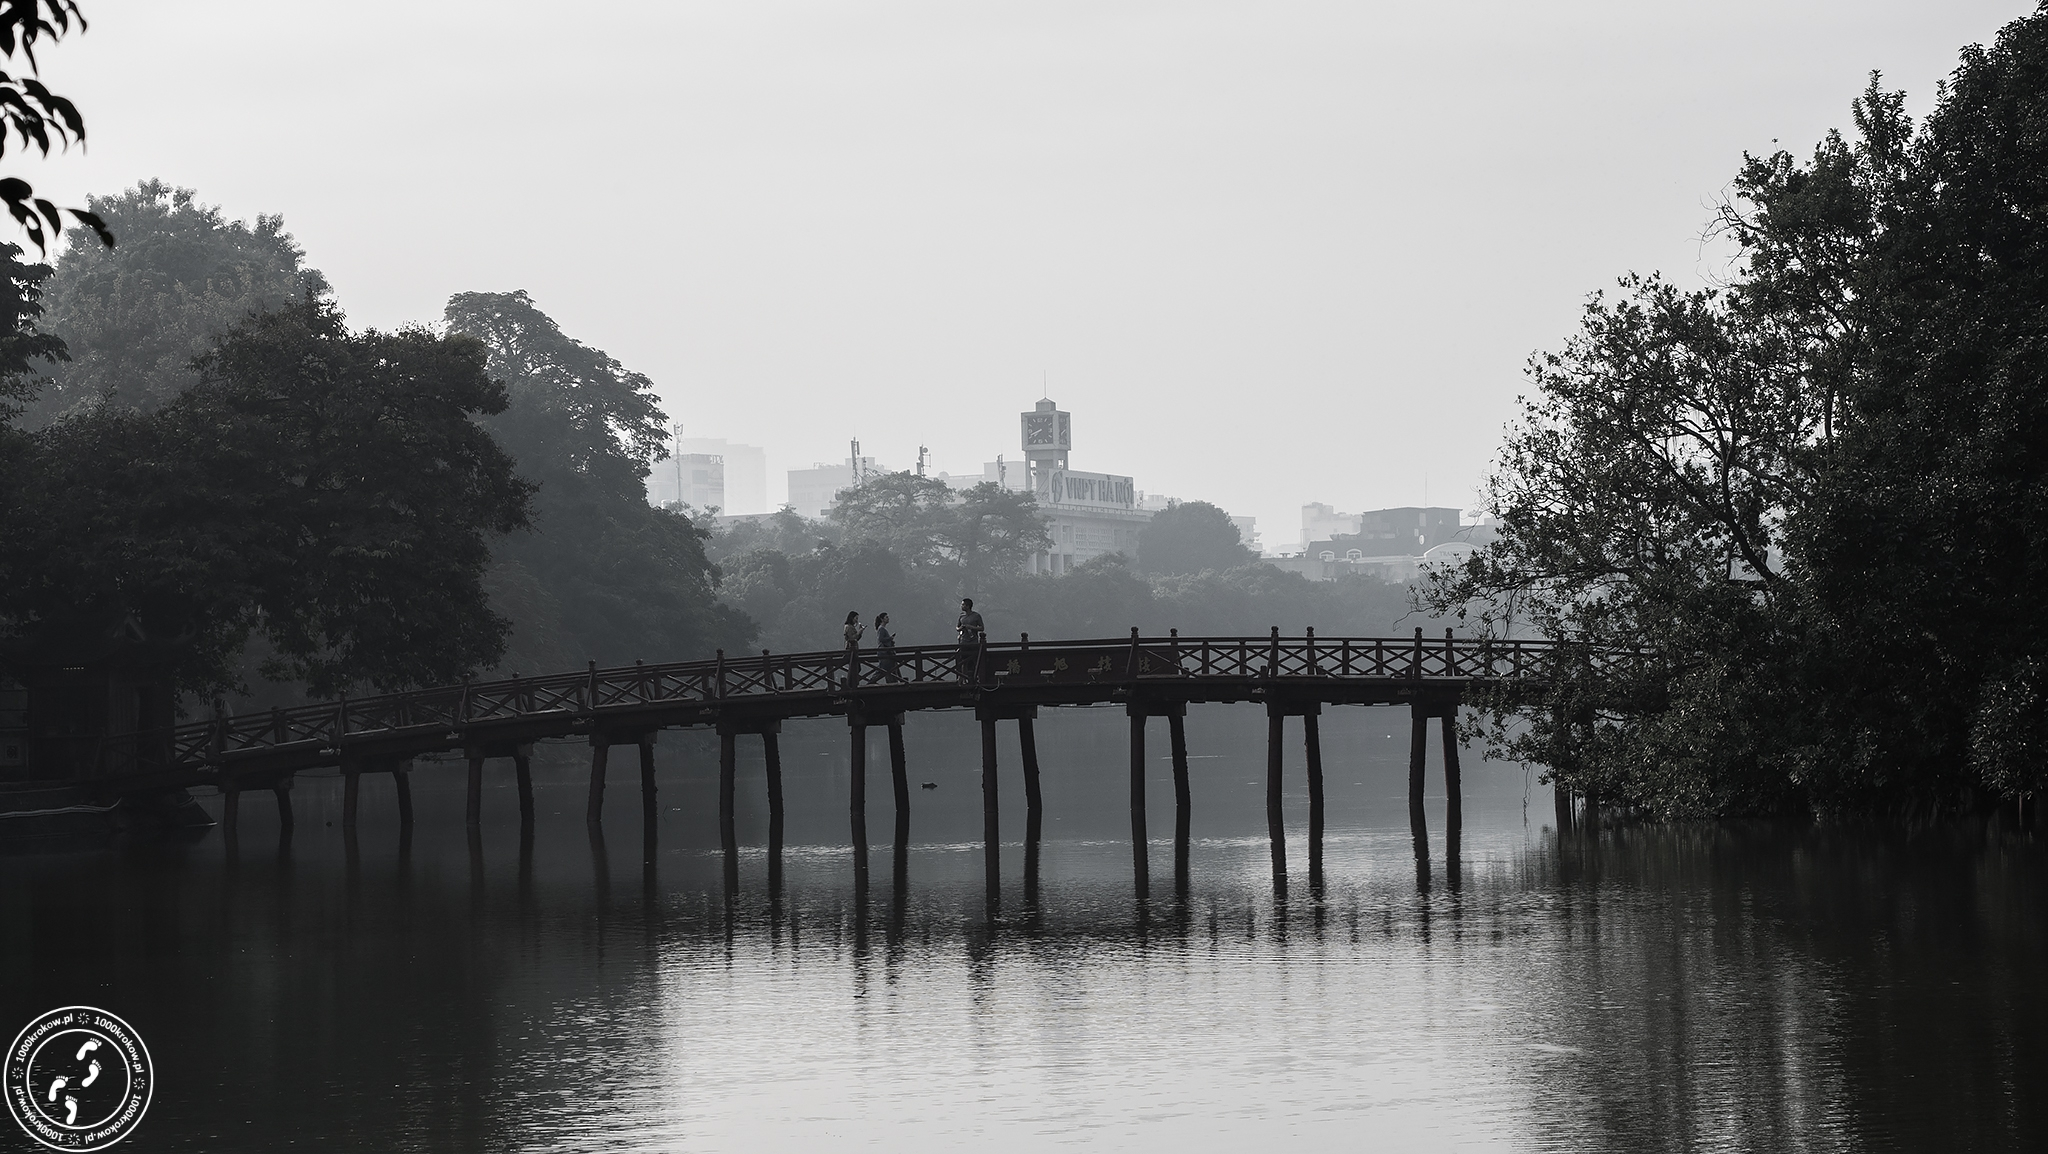 Hanoi Cầu Thê Húc